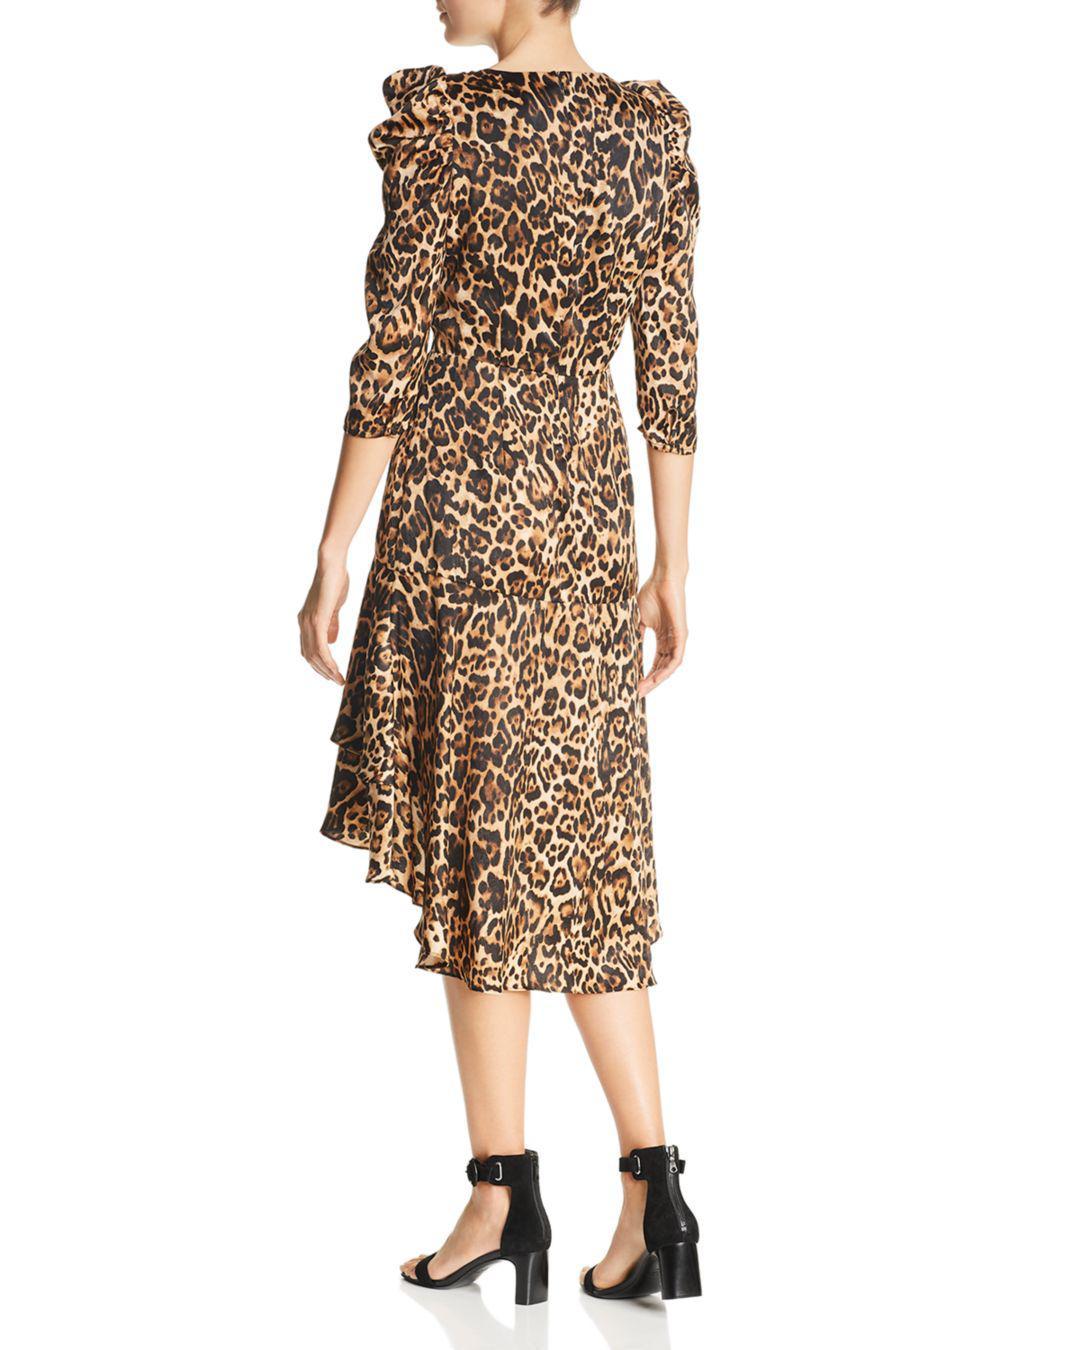 81feaaaea76 Lyst - Lucy Paris Drew Puff-sleeve Leopard Dress in Brown